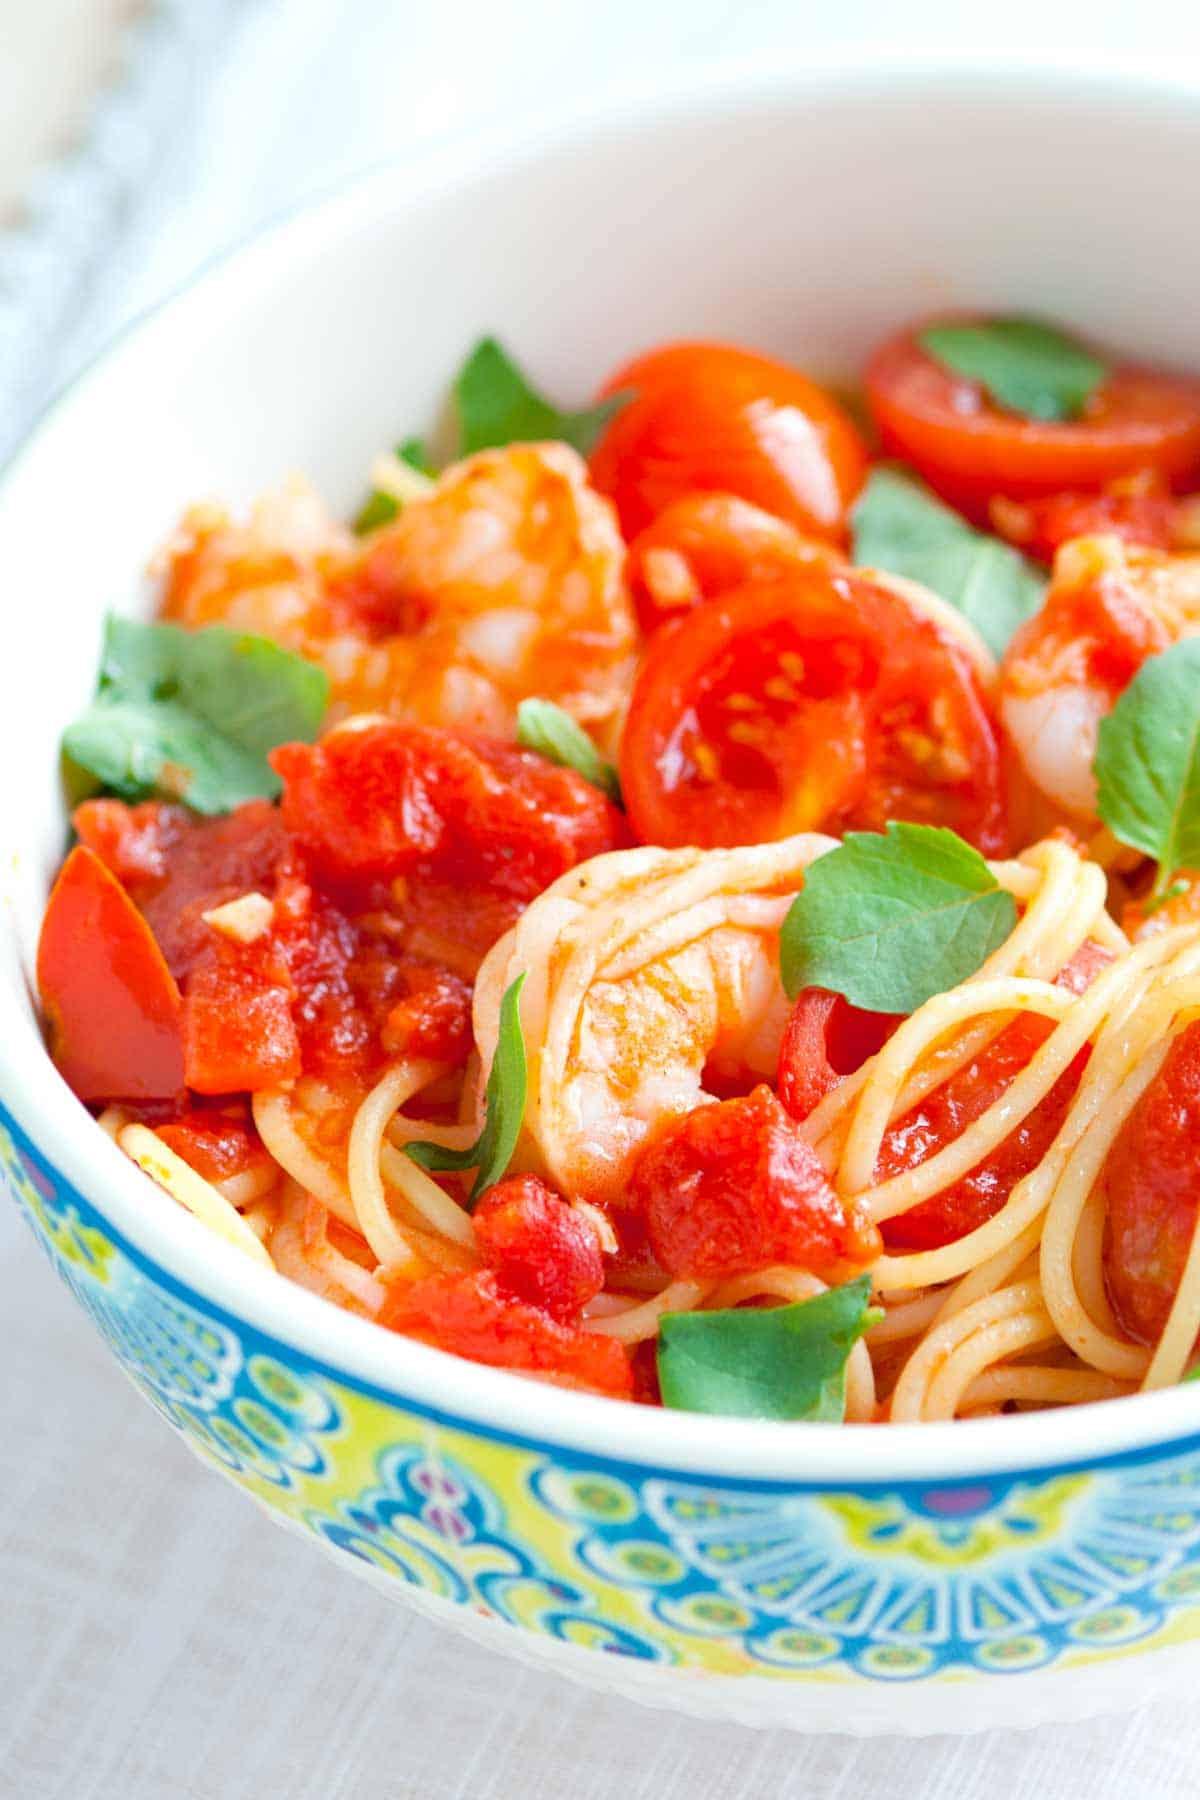 15 Minute Shrimp Pasta Recipe With Tomato And Basil